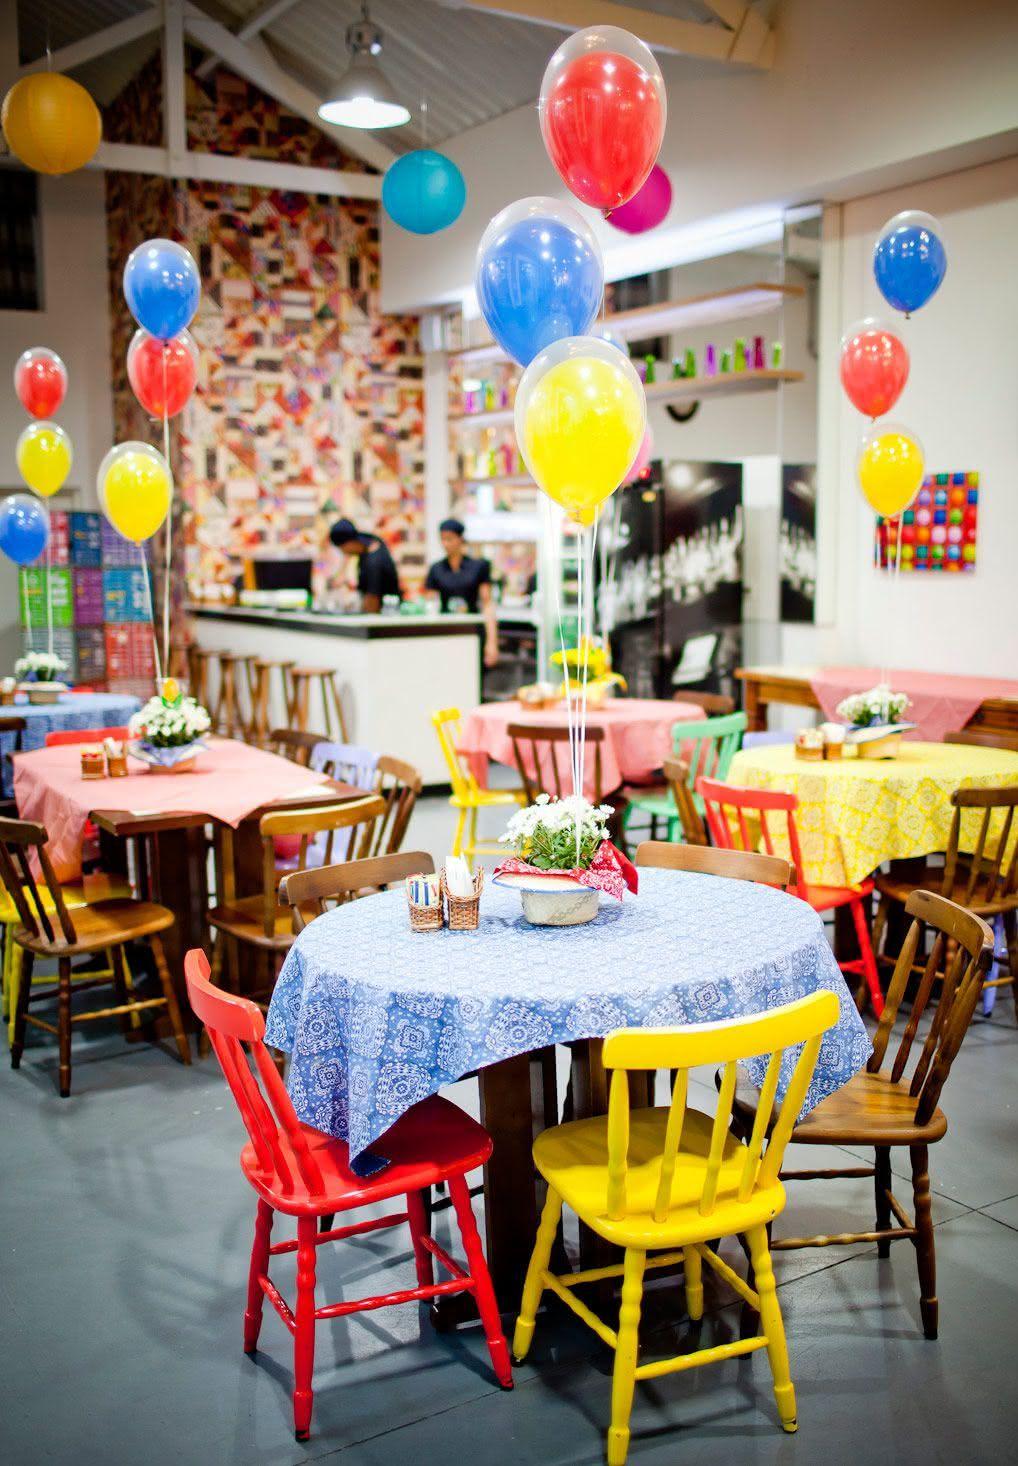 Balões de gás hélio para decorar a festa junina